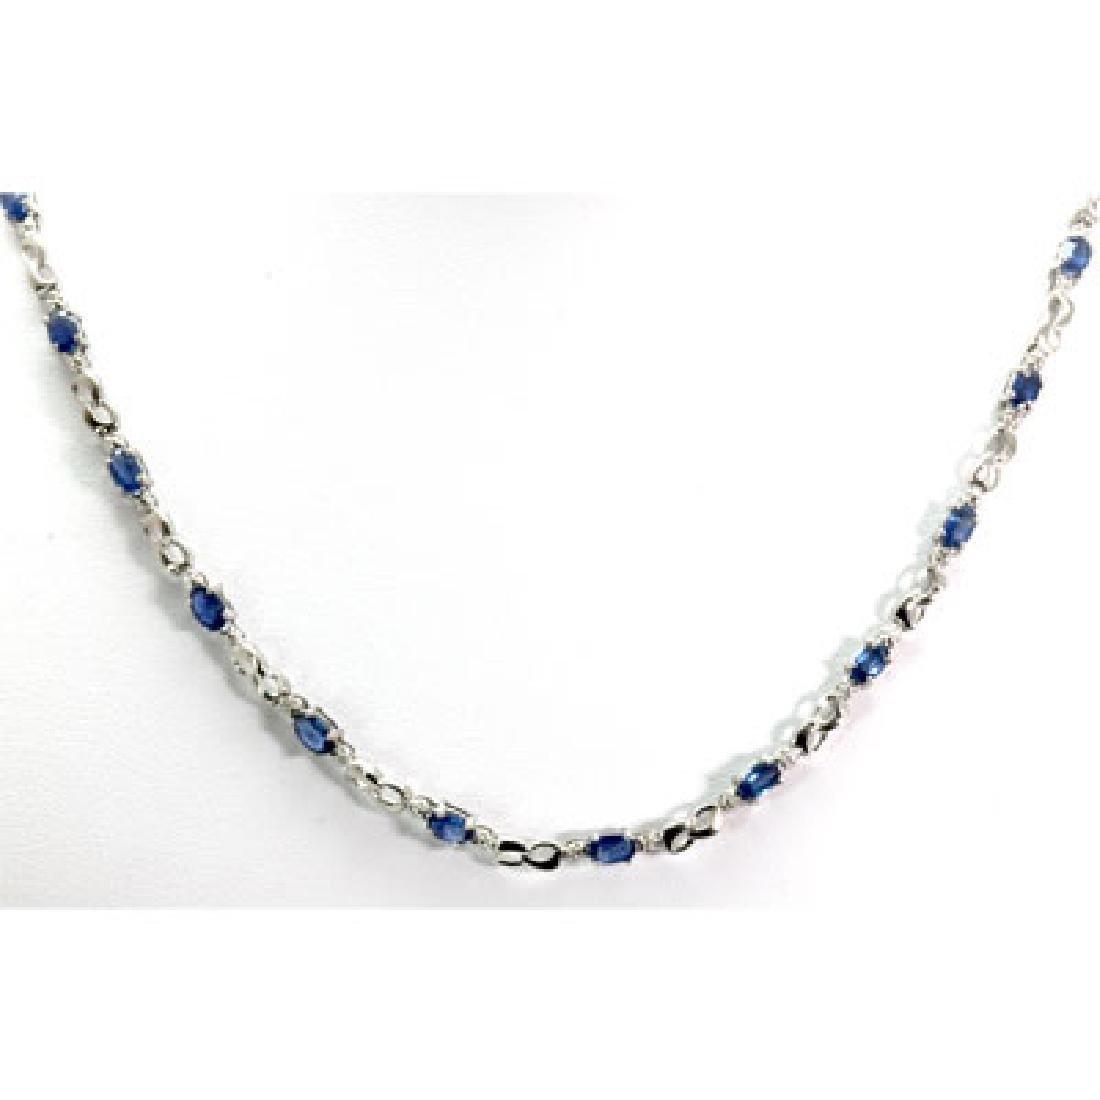 Genuine 4.62 ctw Tanzanite Diamond Necklace10k W/Y Gold - 3